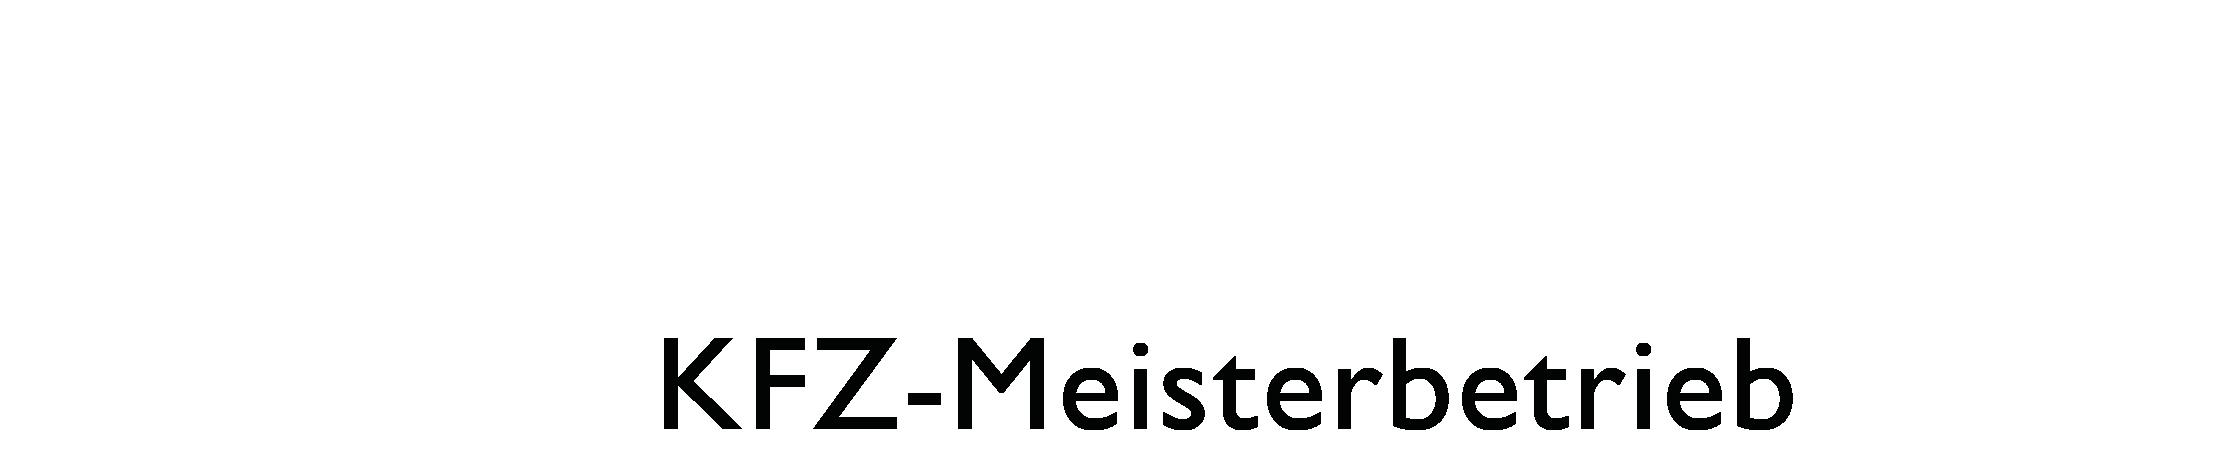 Peter Zobel GmbH - KFZ Meisterbetrieb